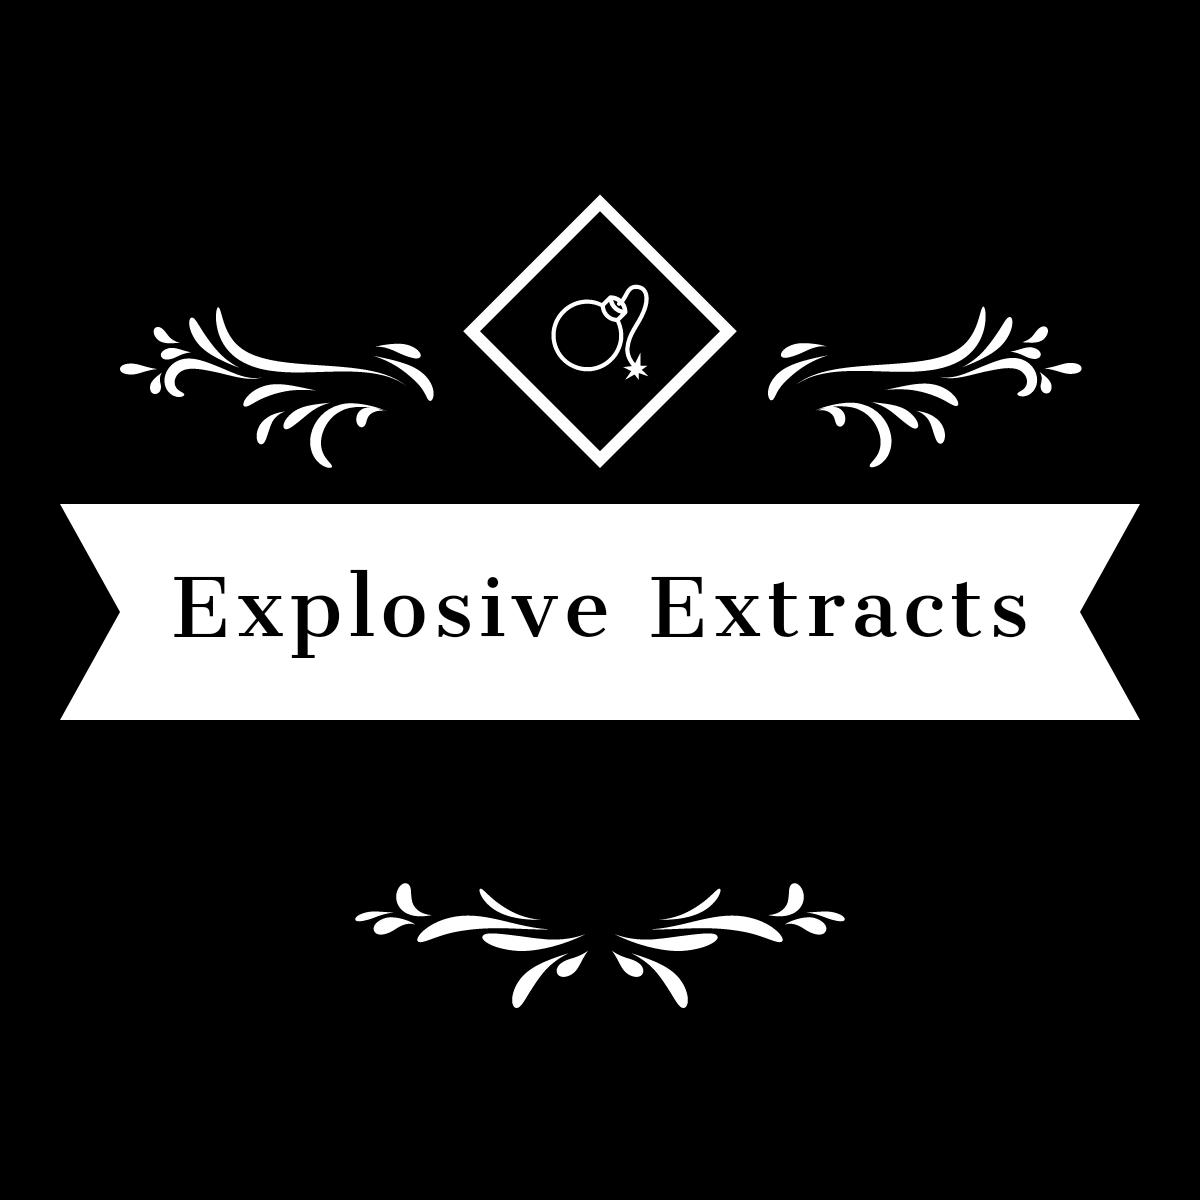 Explosive Extracts